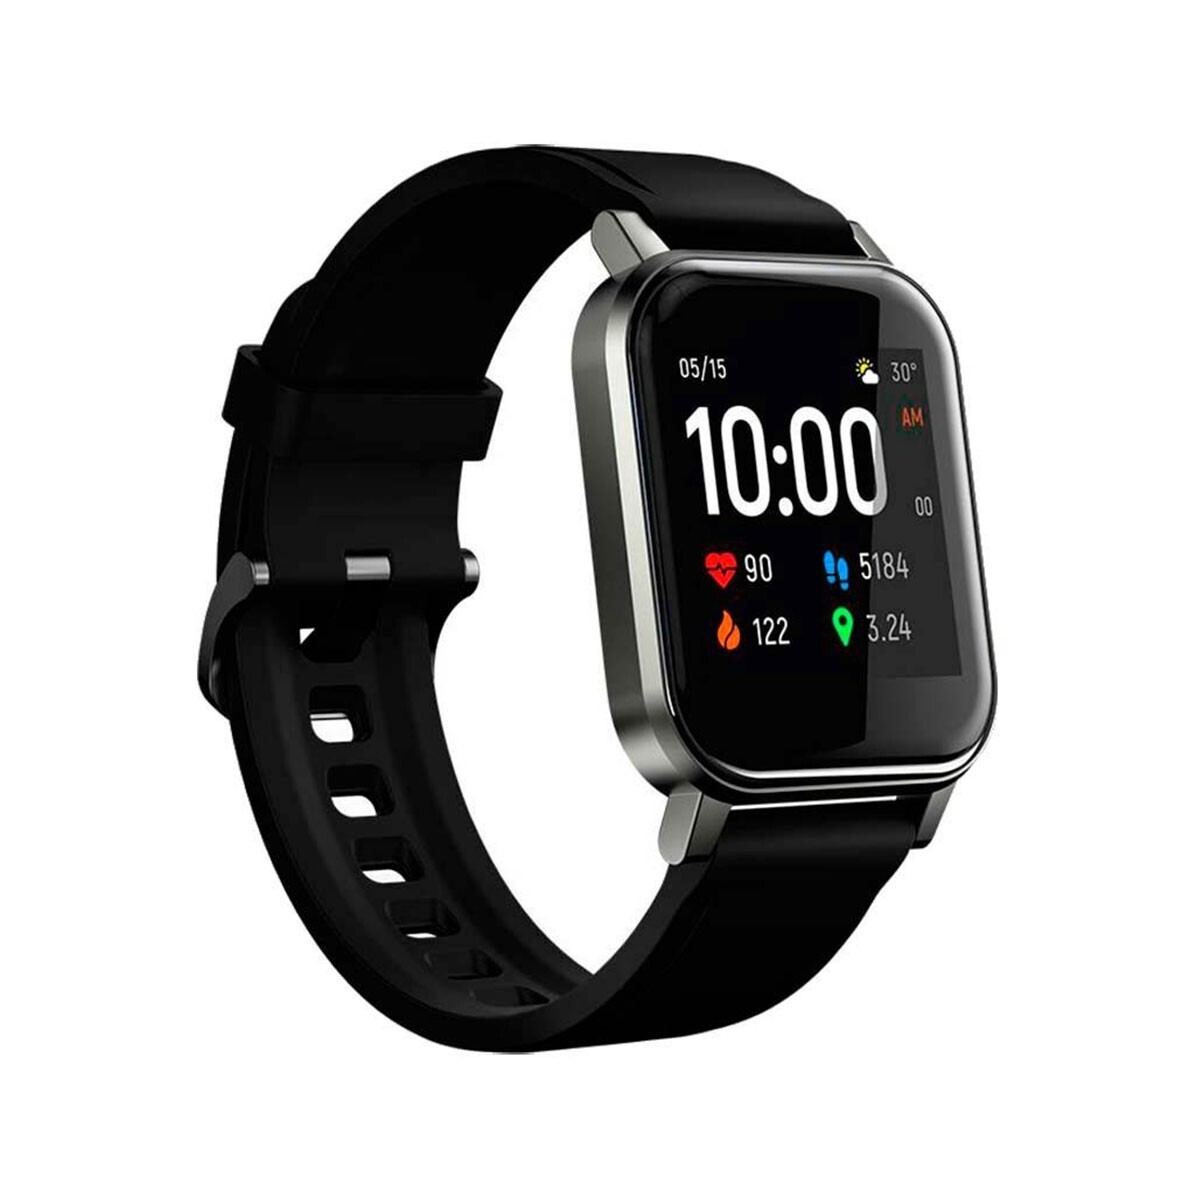 Умные часы Haylou Haylou LS02 Global, черный